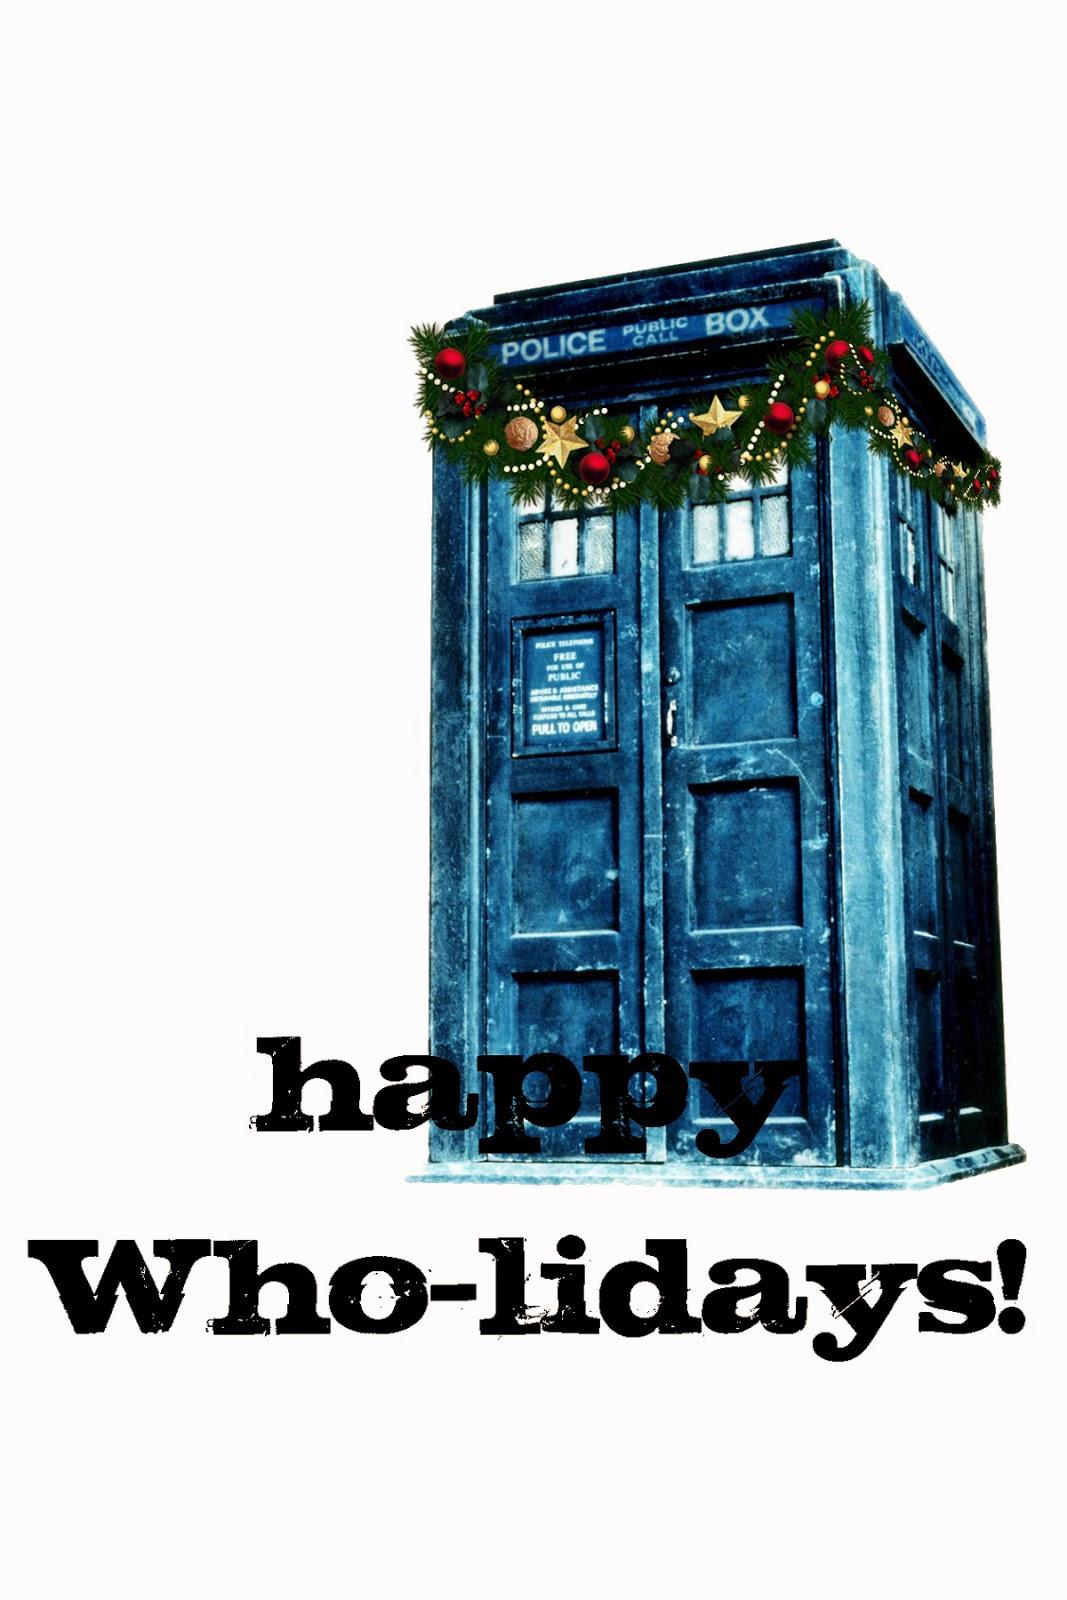 http://www.doodlecraftblog.com/2013/08/doctor-who-inspired-christmas-card.html